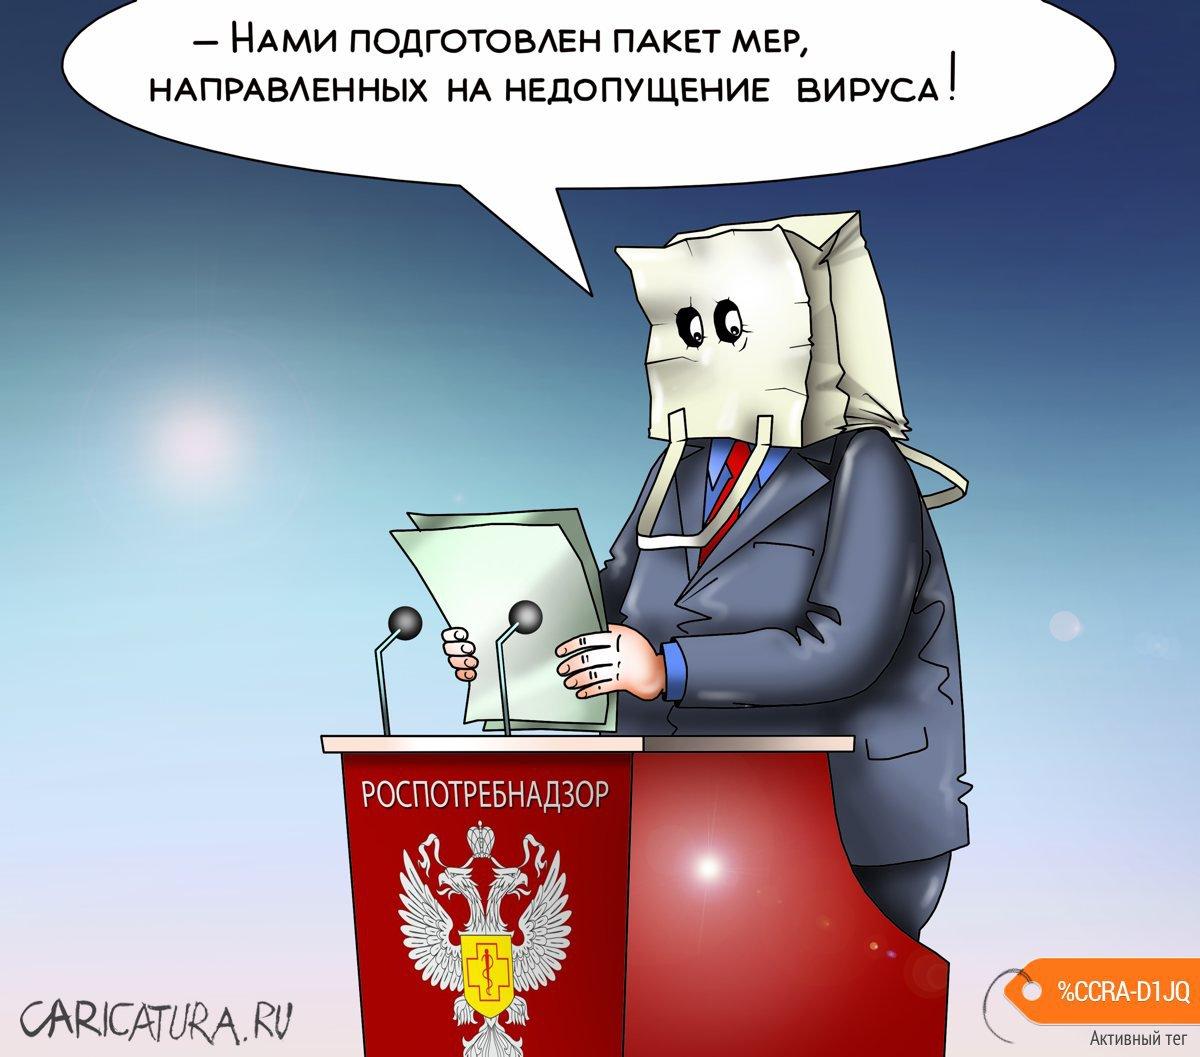 https://caricatura.ru/daily/korsun/pic/karikatura-rospotrebnadzor-podgotovil-mery-protiv-koronavirus_(sergey-korsun)_2006.jpg